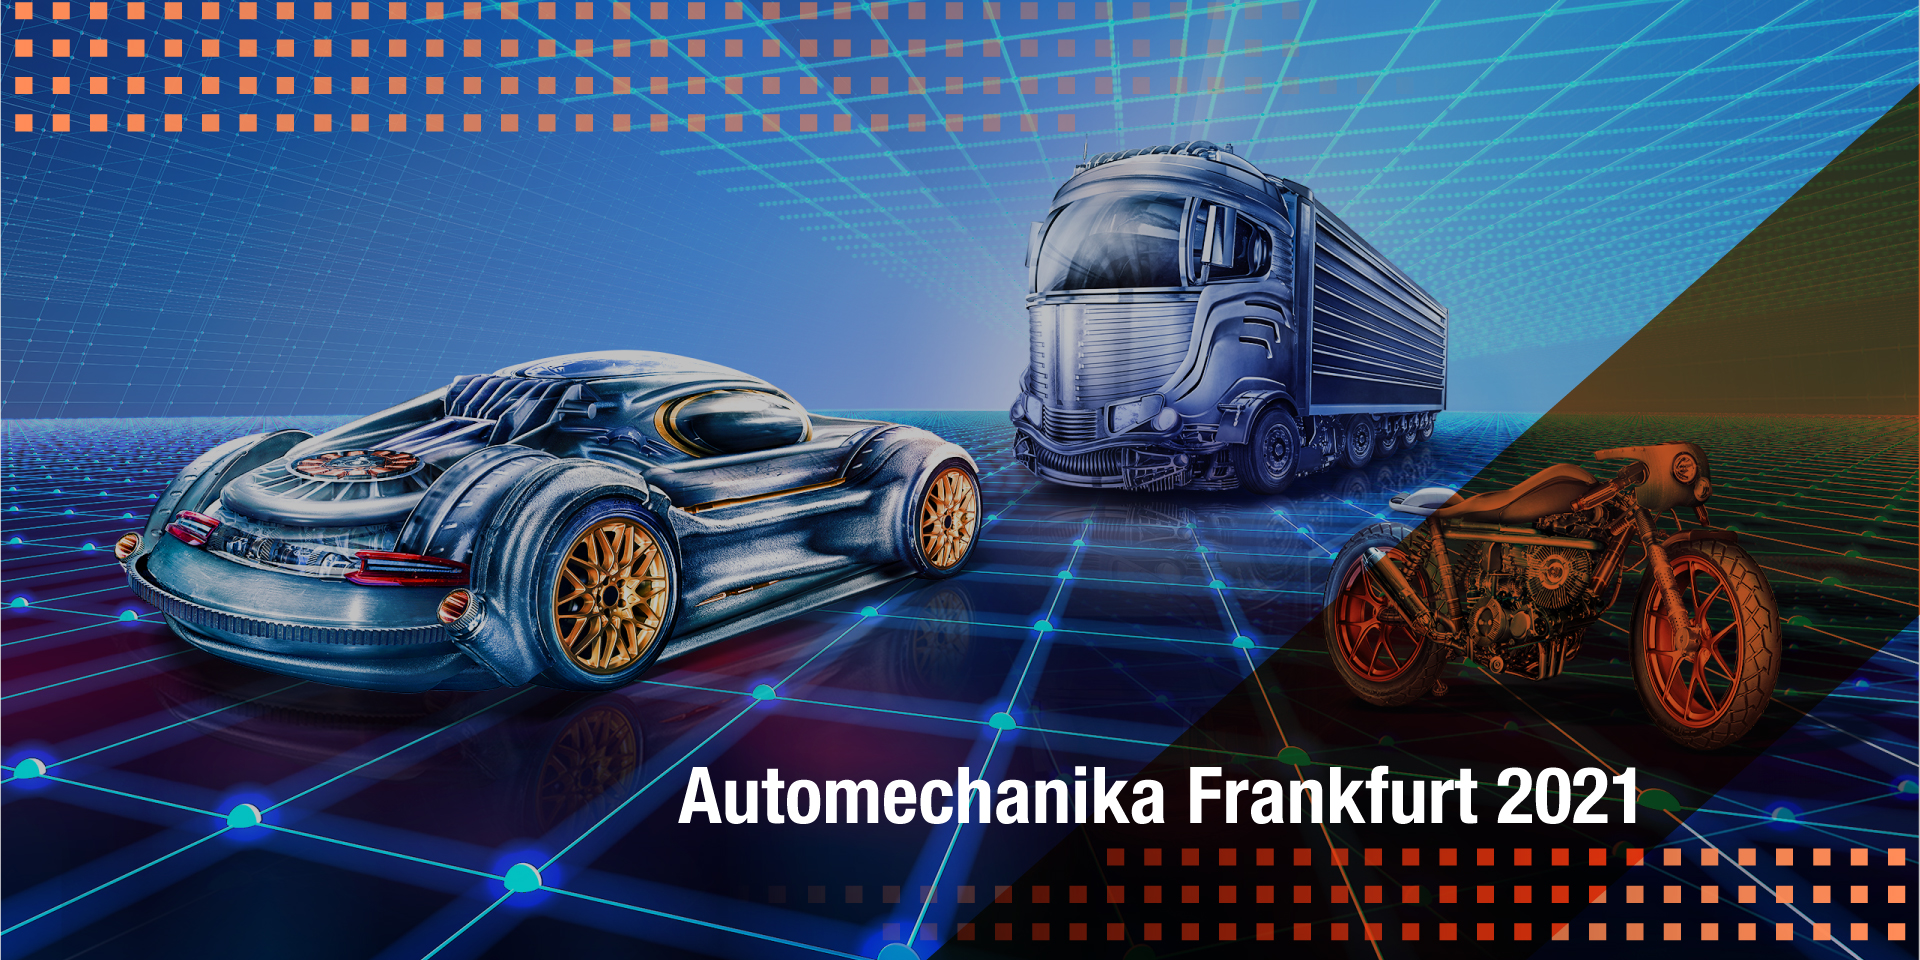 Automechanika Frankfurt 2021